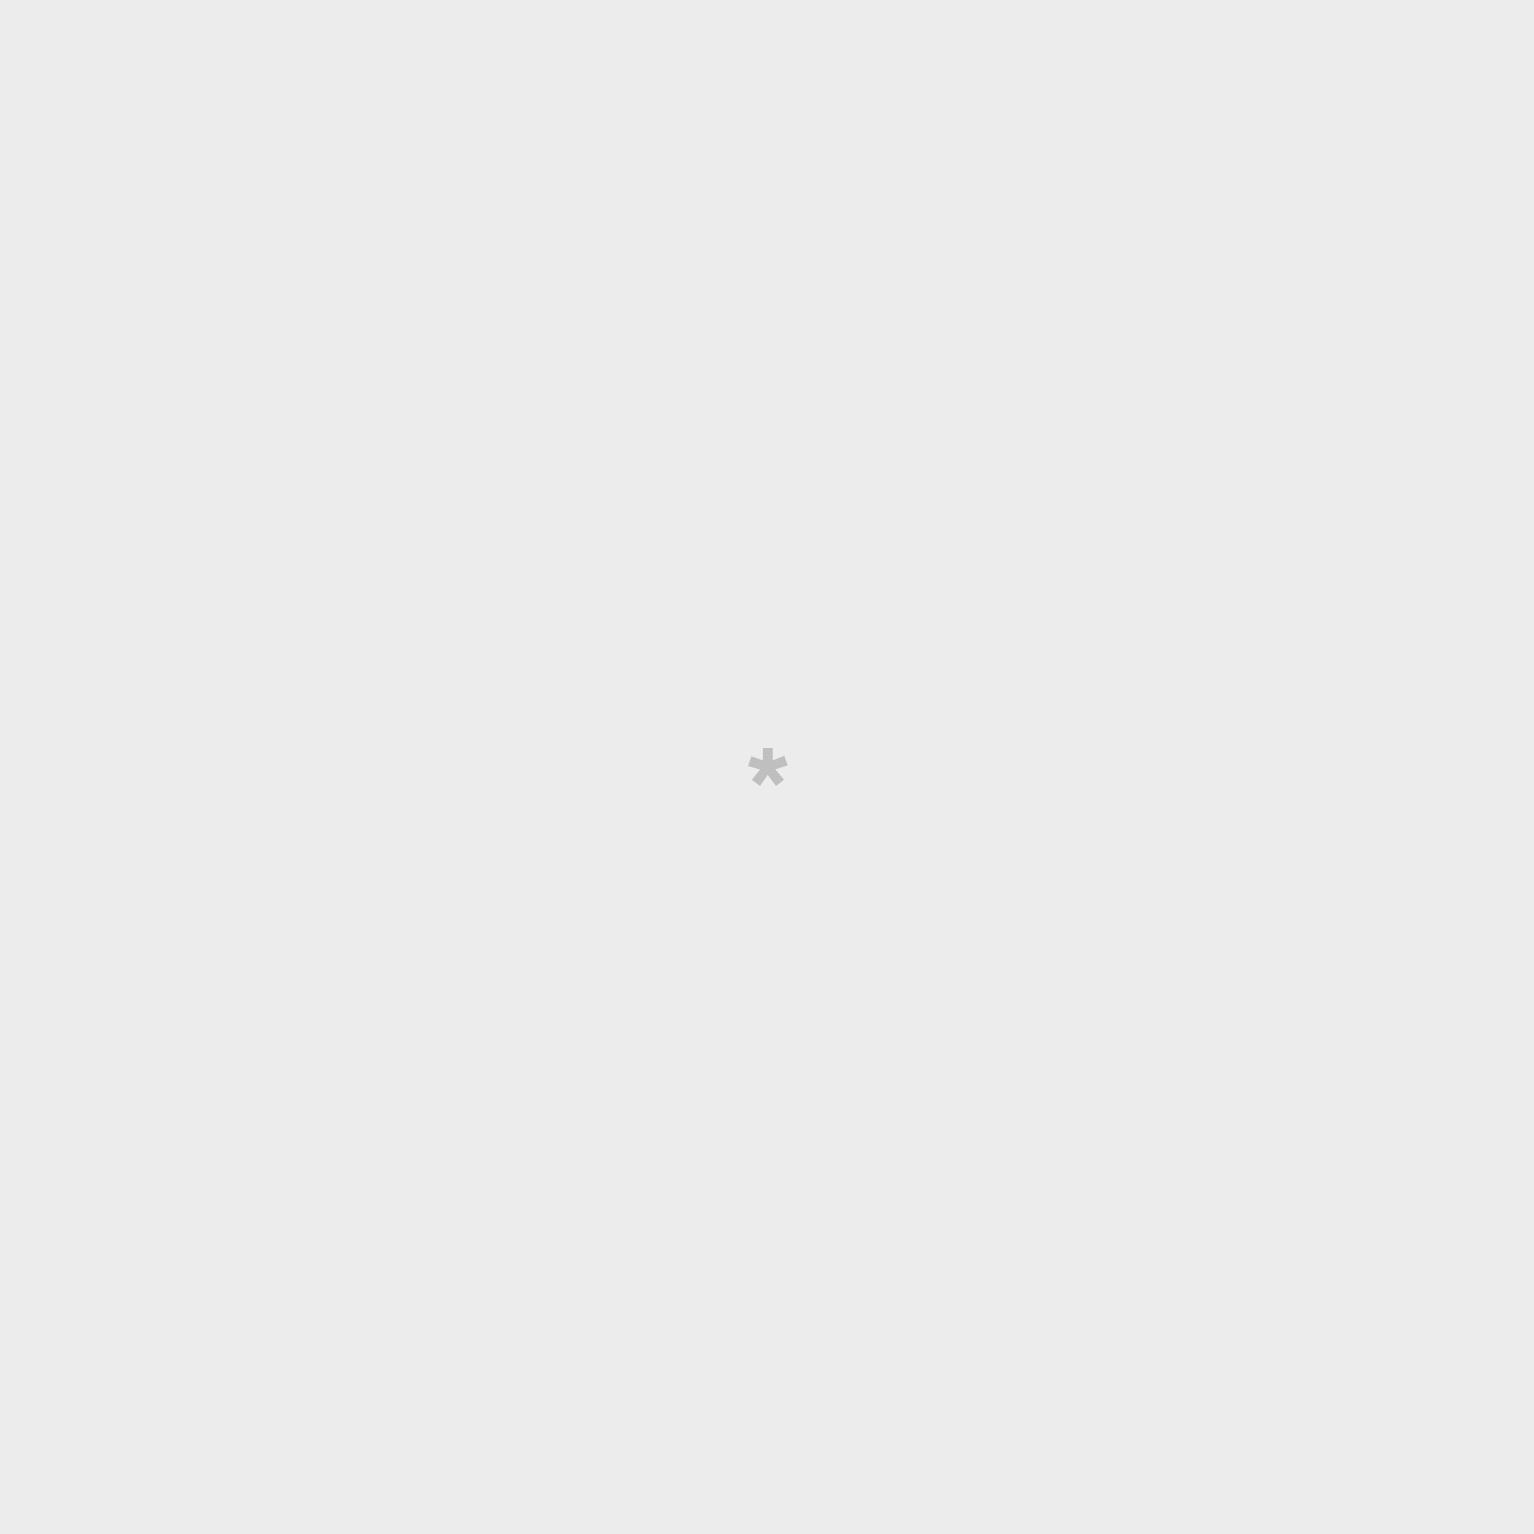 Extras para personalizar a tua mochila ou o que quiseres - Let's wow!